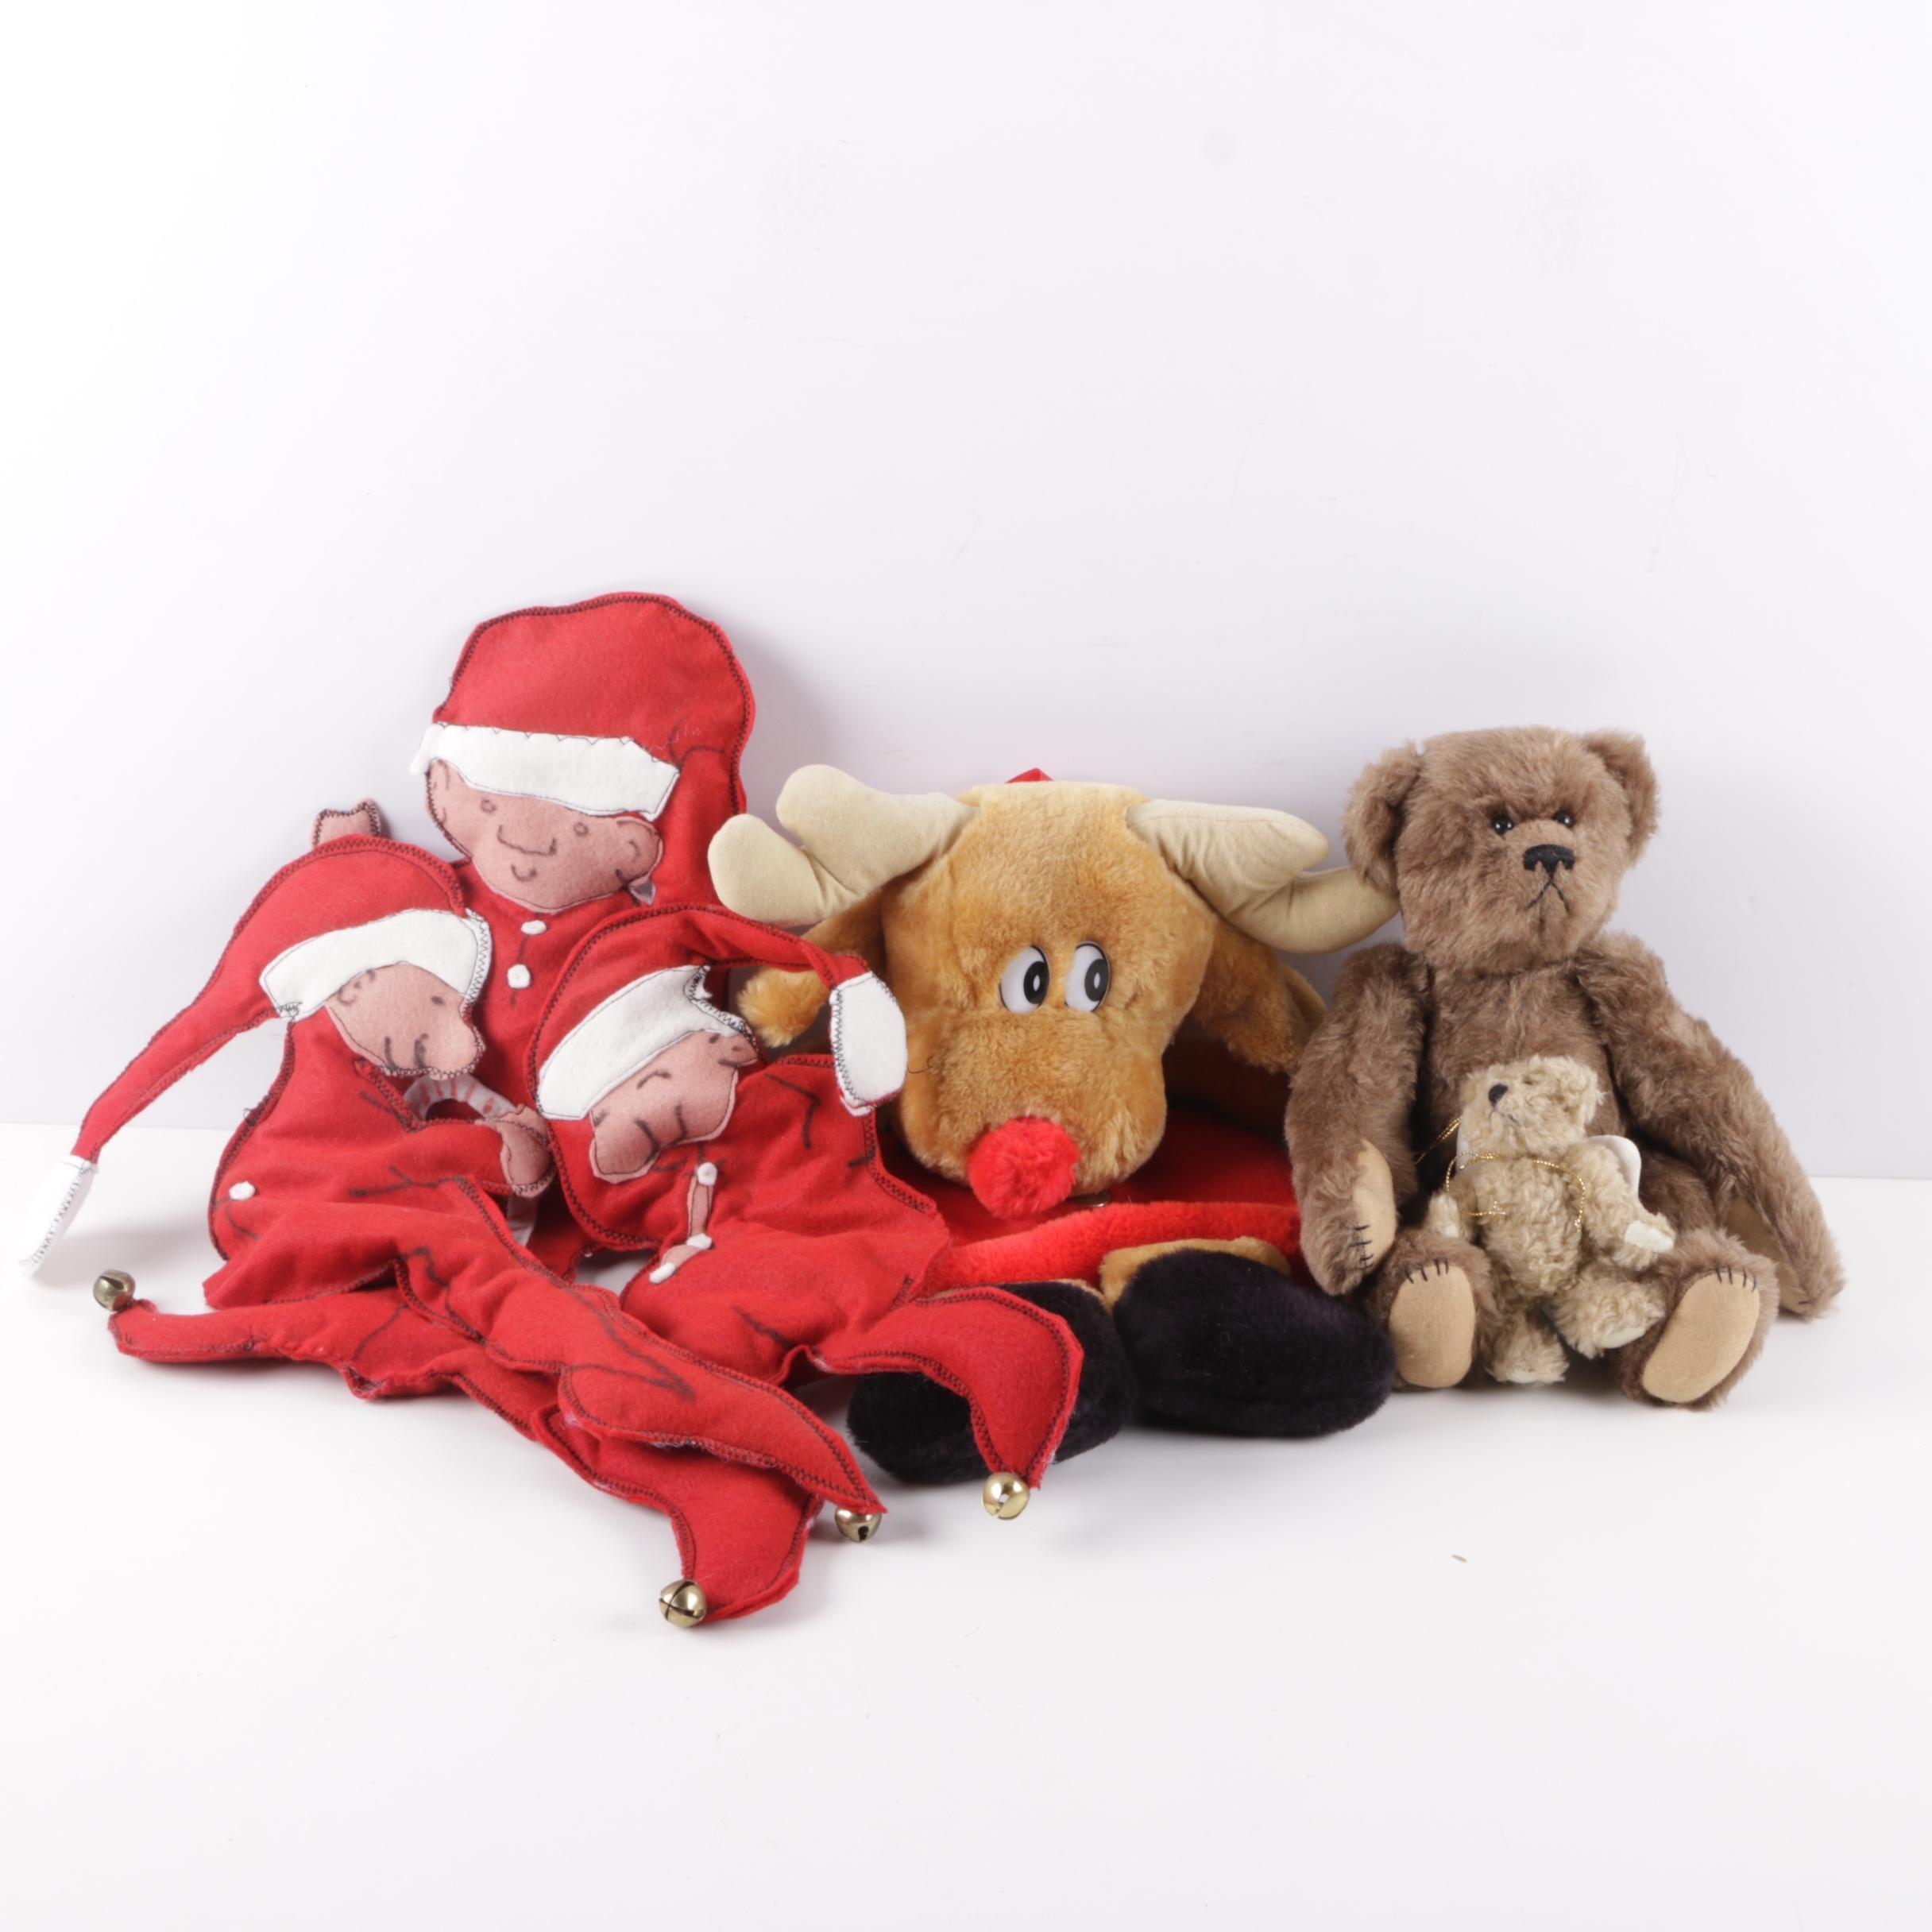 Assorted Christmas Plush Items